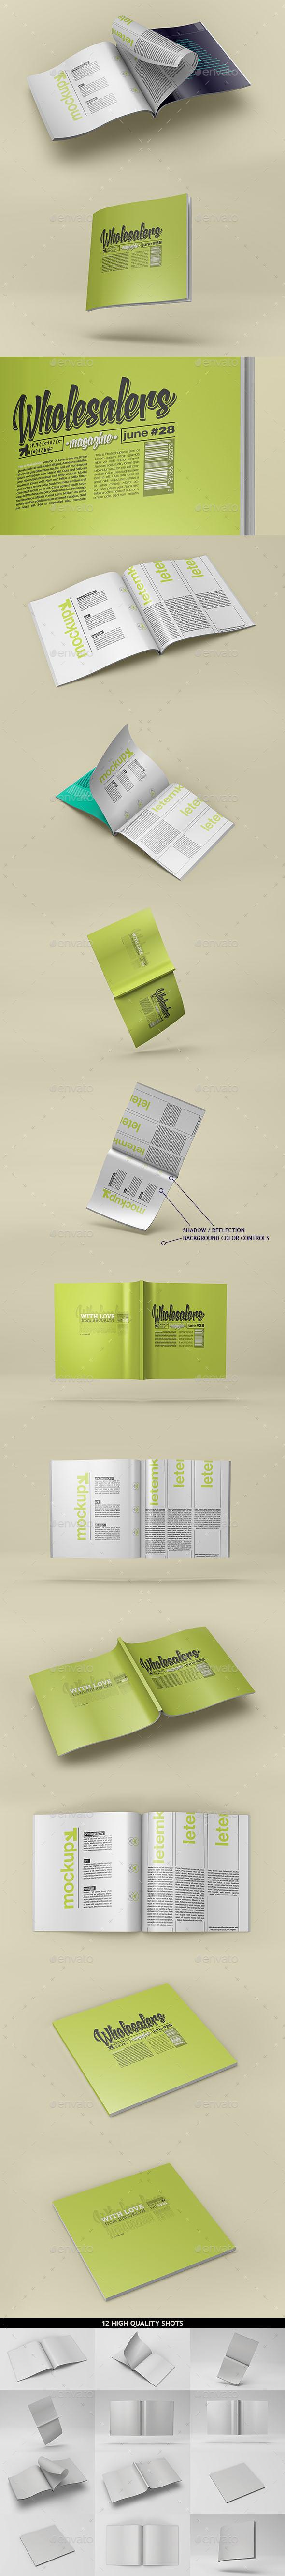 Square Magazine Catalog Mockup - Magazines Print